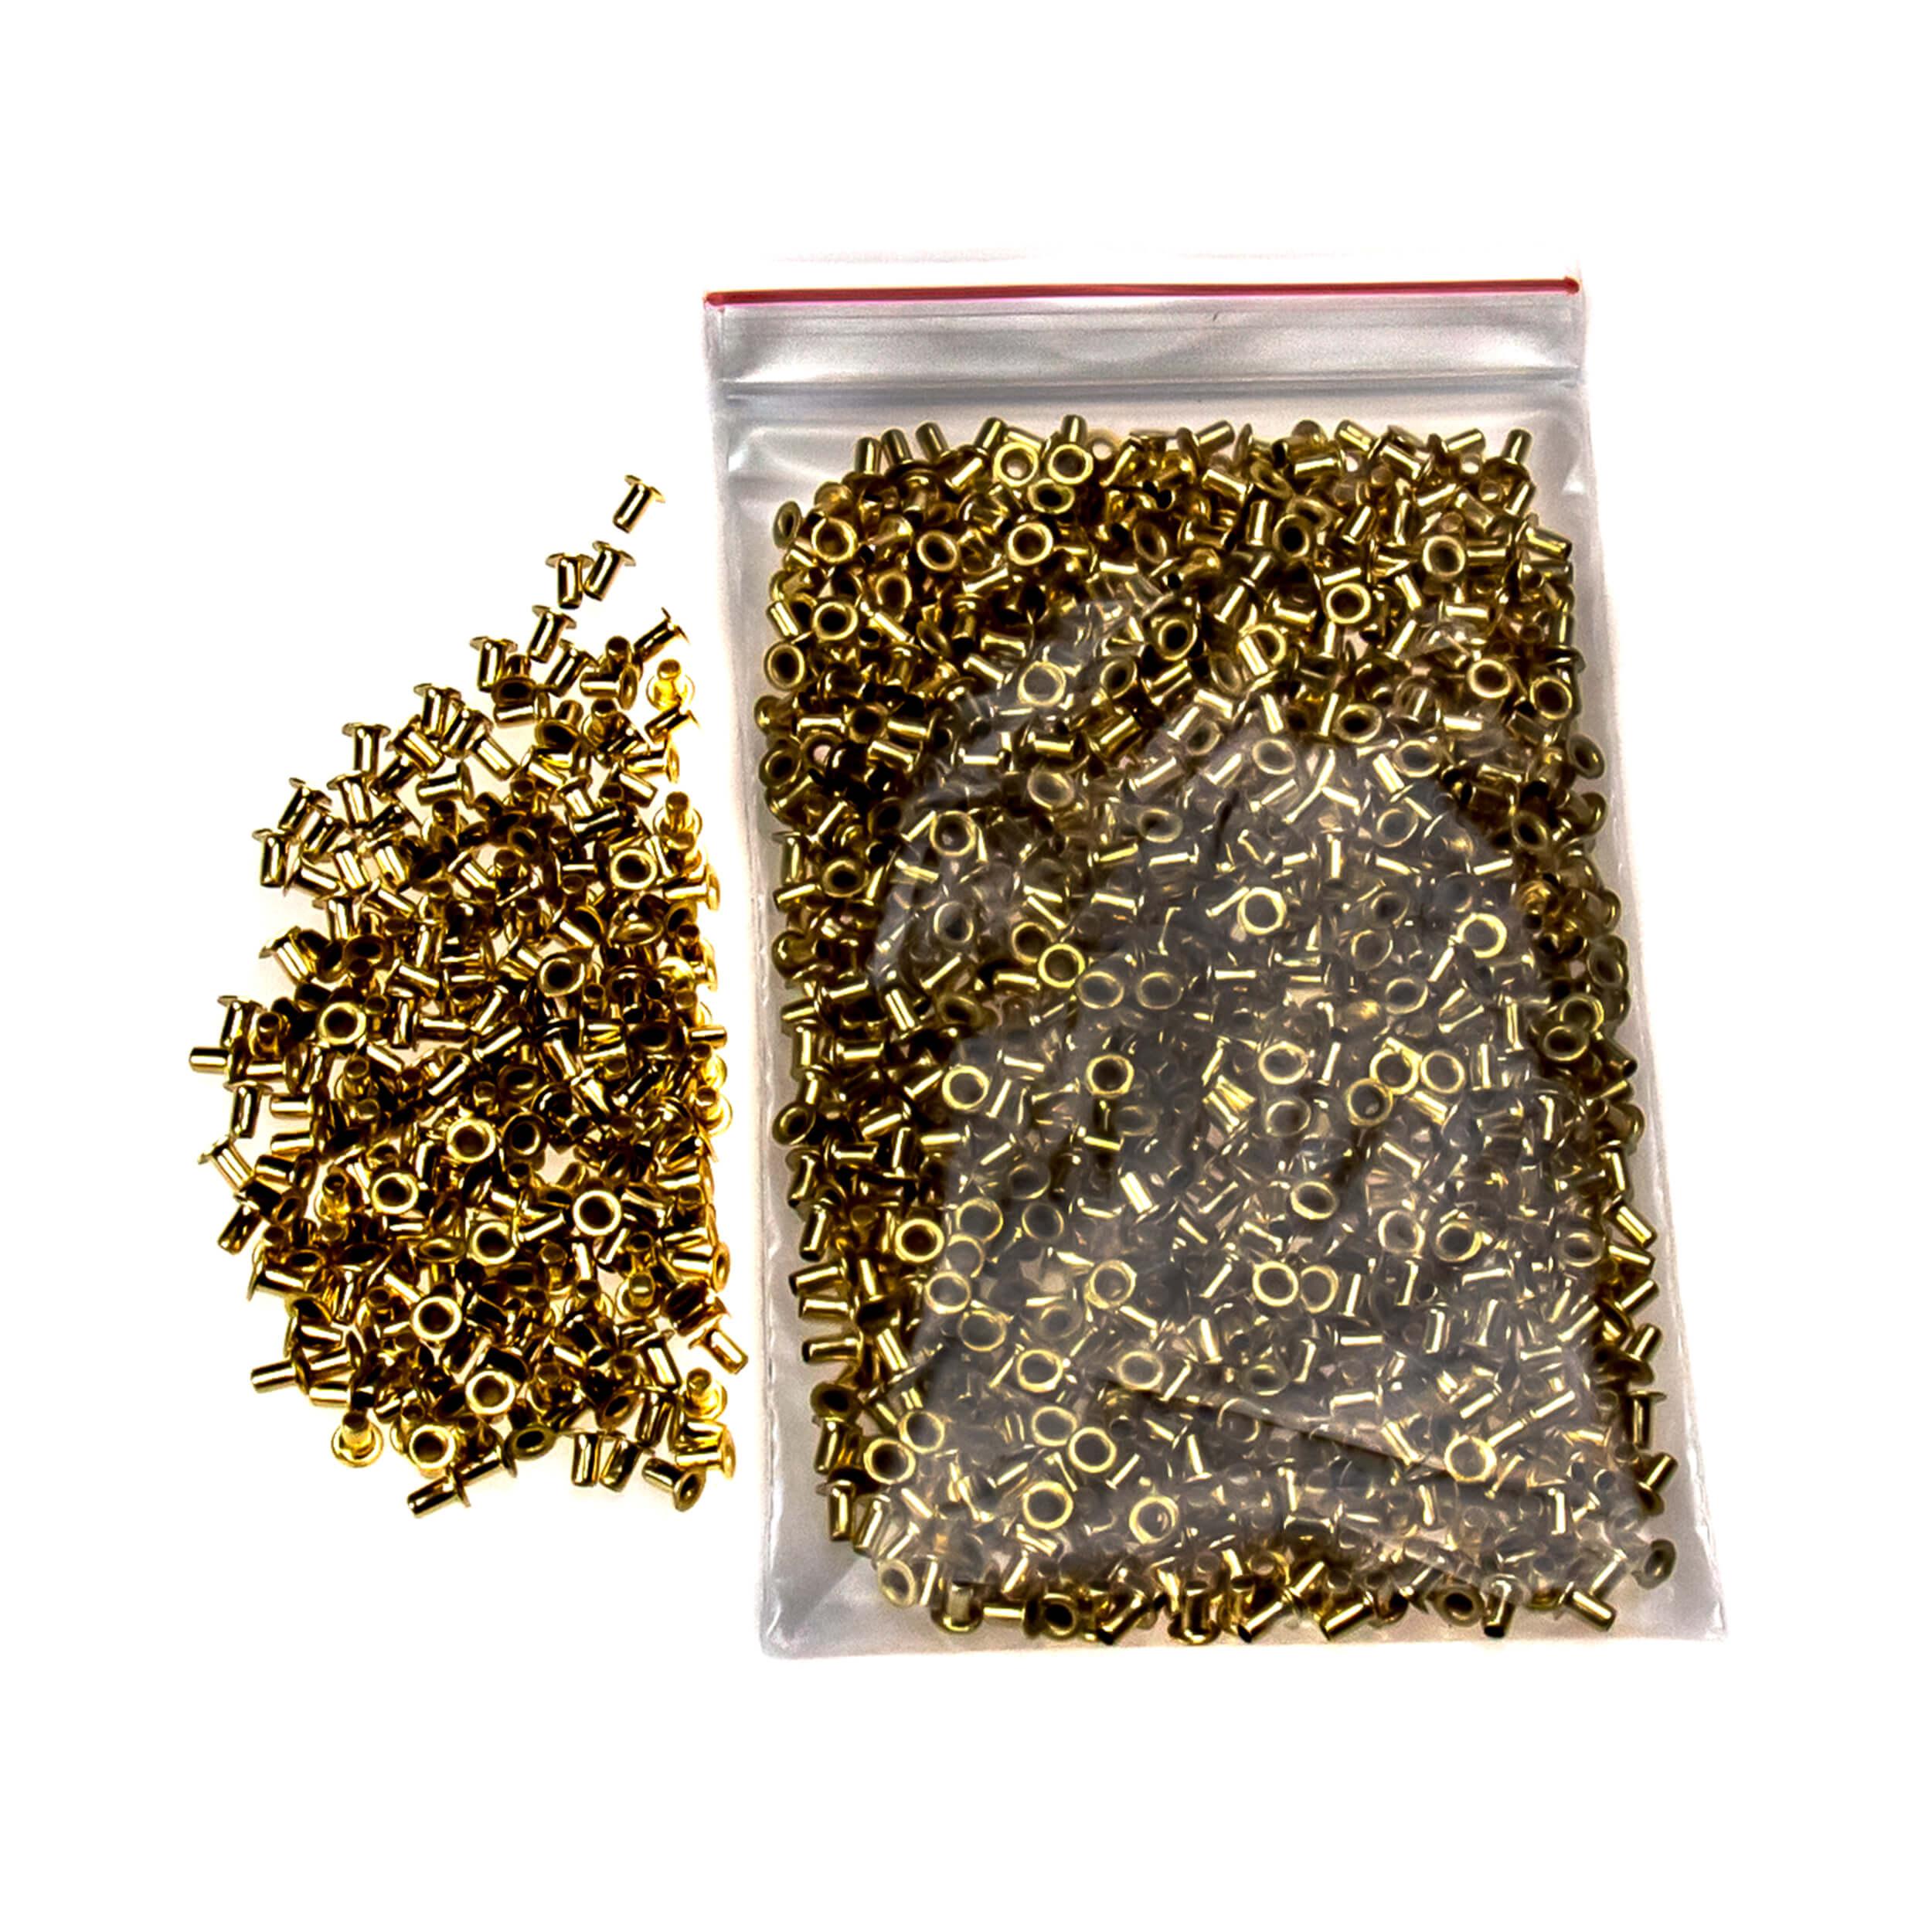 Втулки D2.5 для боковых планок рамок (100 грамм, медь) фото